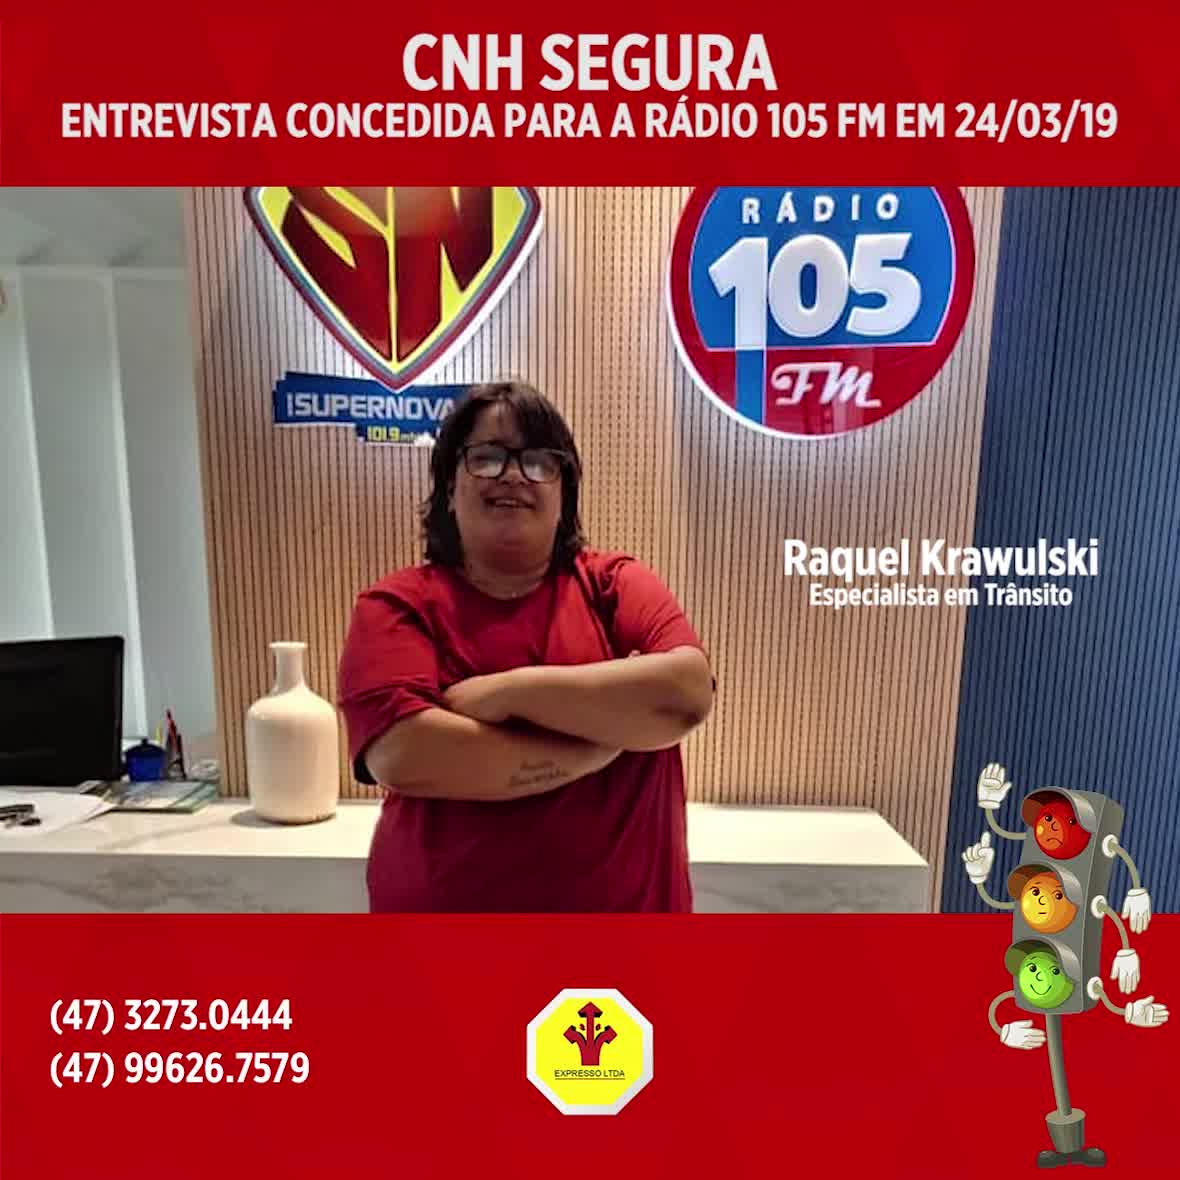 CNH SEGURA - RAQUEL KRAWULSKI